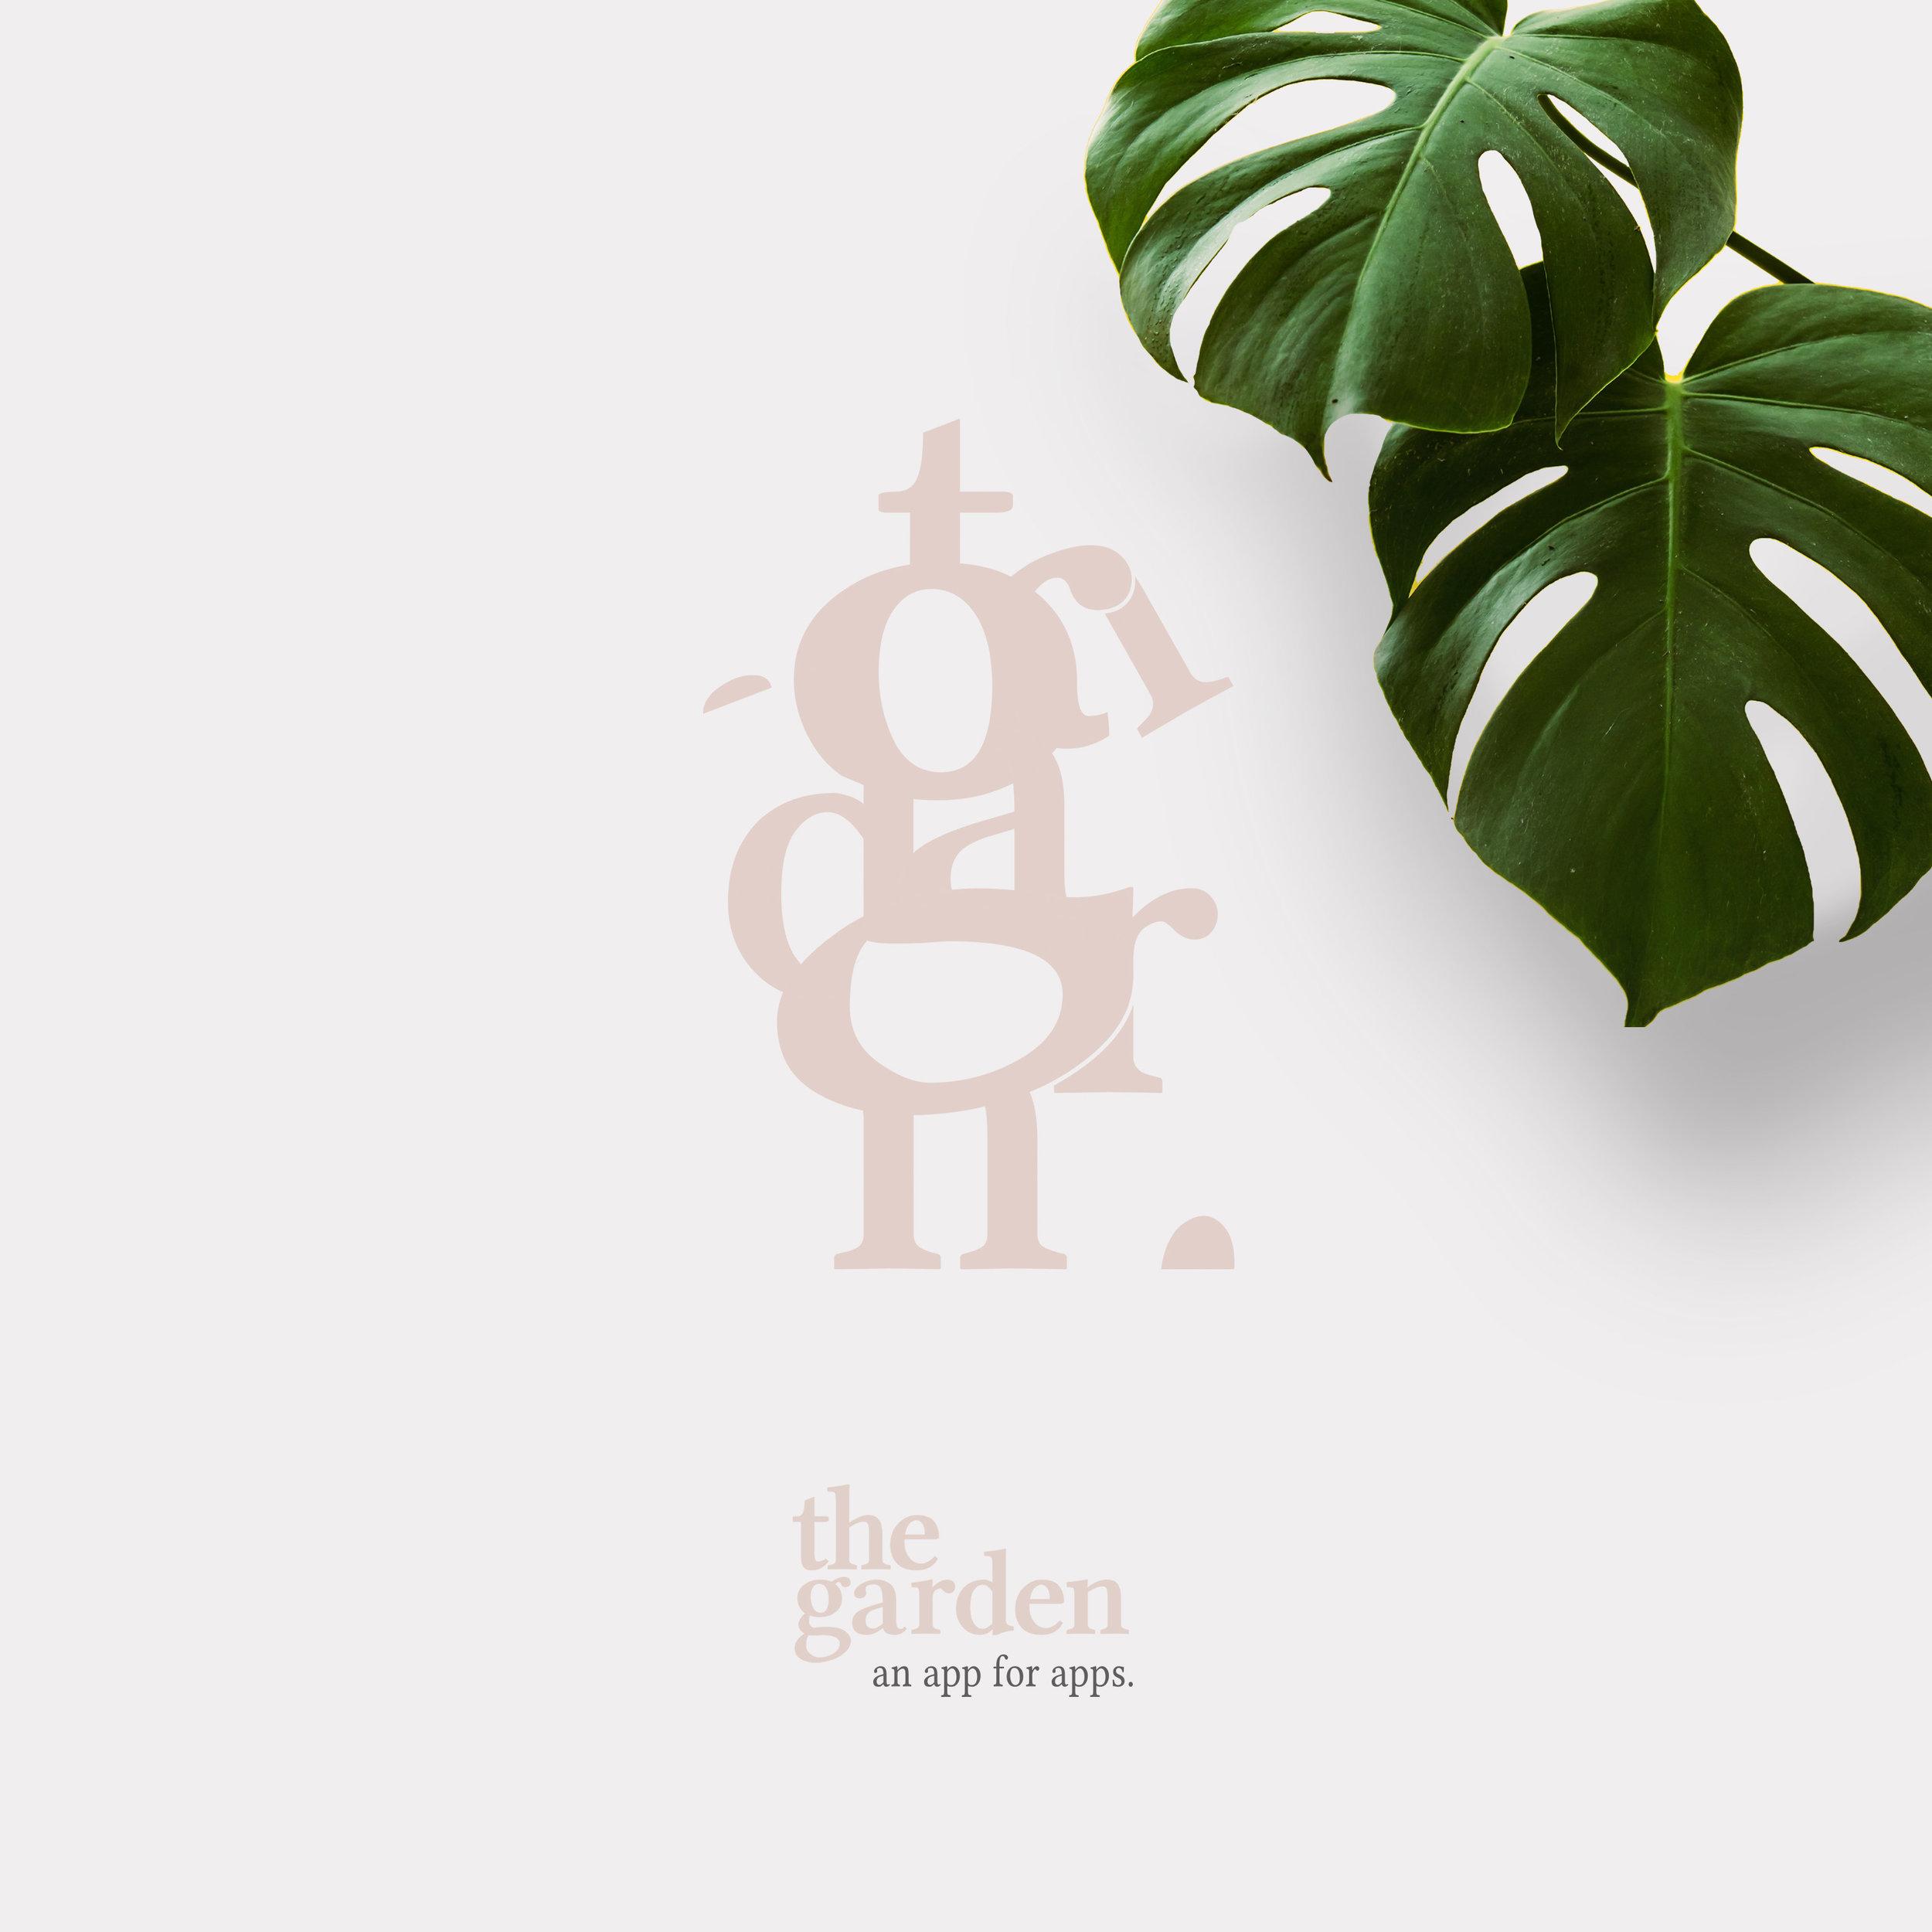 Mahr design_the garden_insta11.jpg